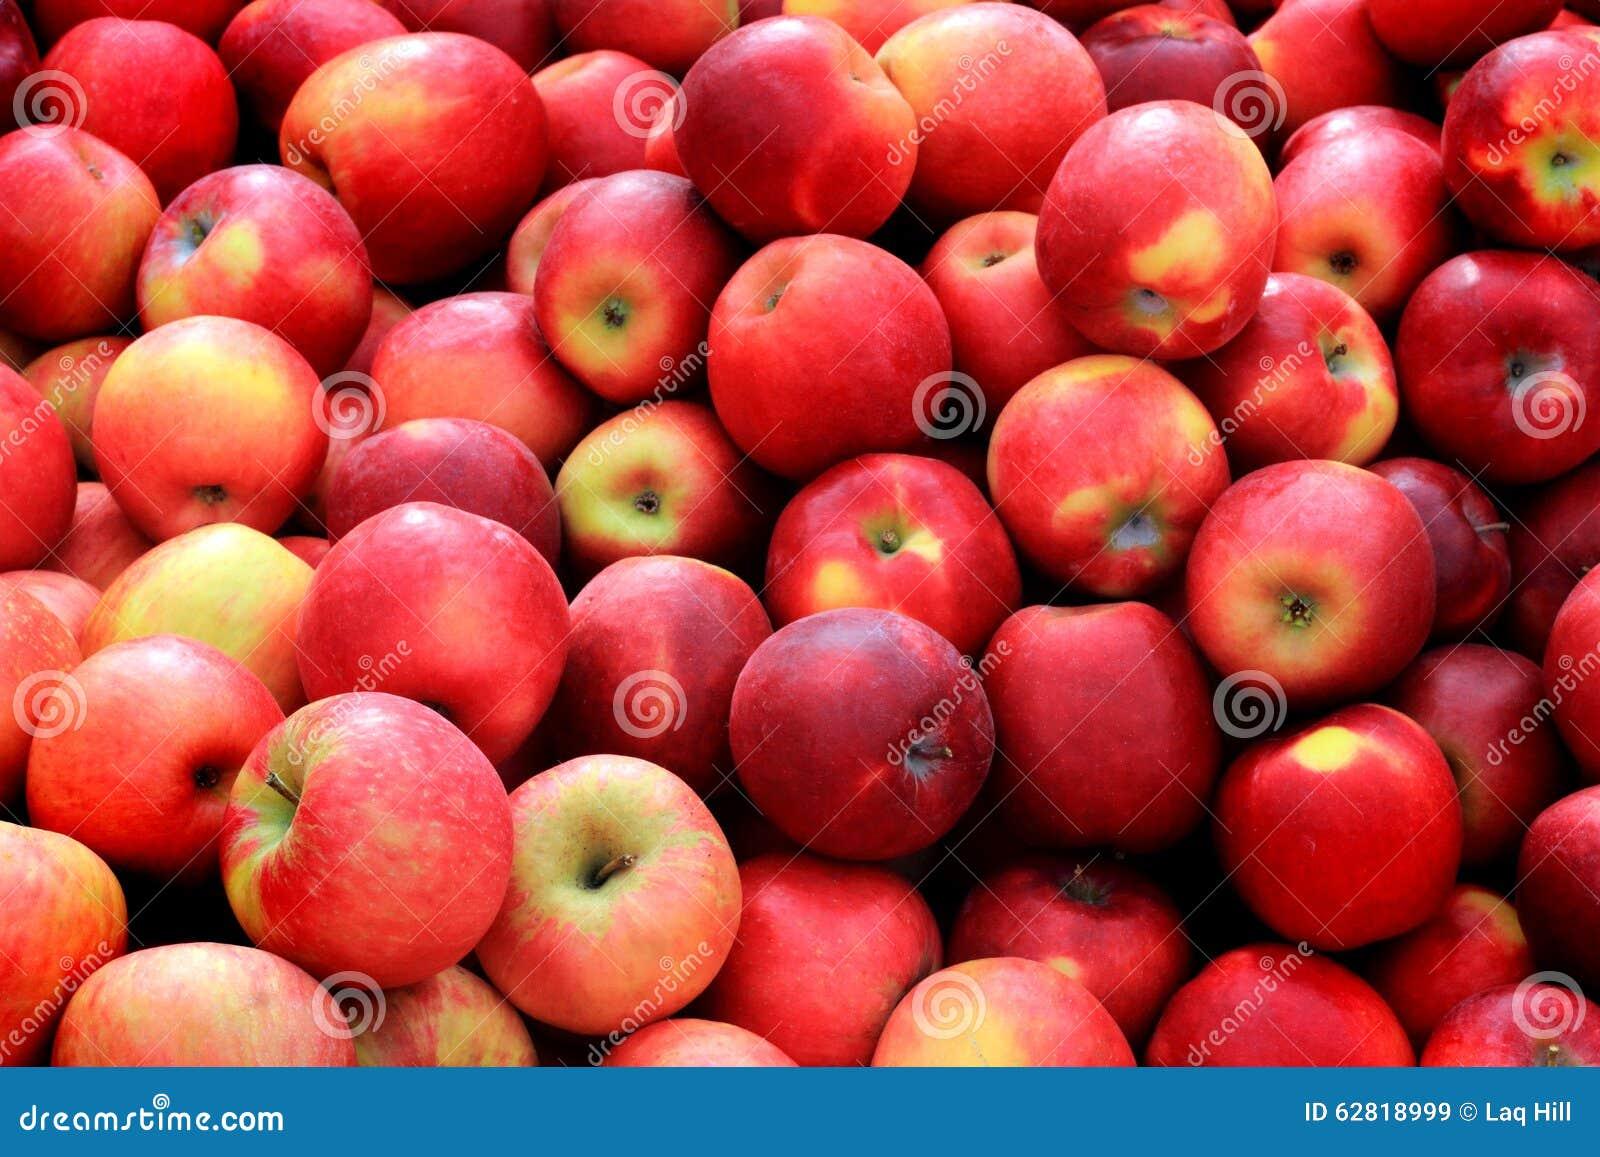 Bushel rode appelen